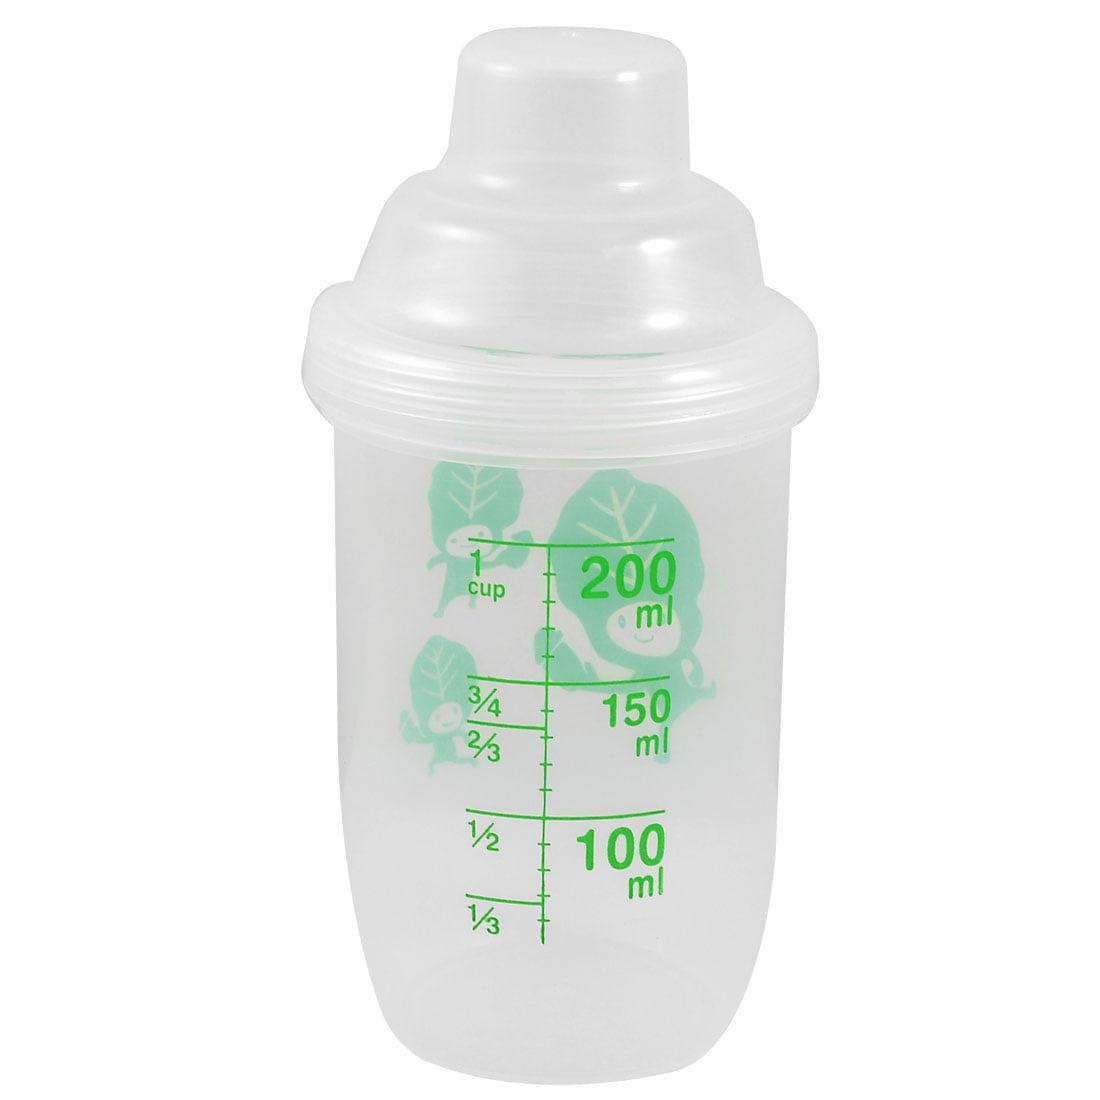 Unique Bargains 200ml Capacity Clear Plastic Round Juice Cup Water Bottle